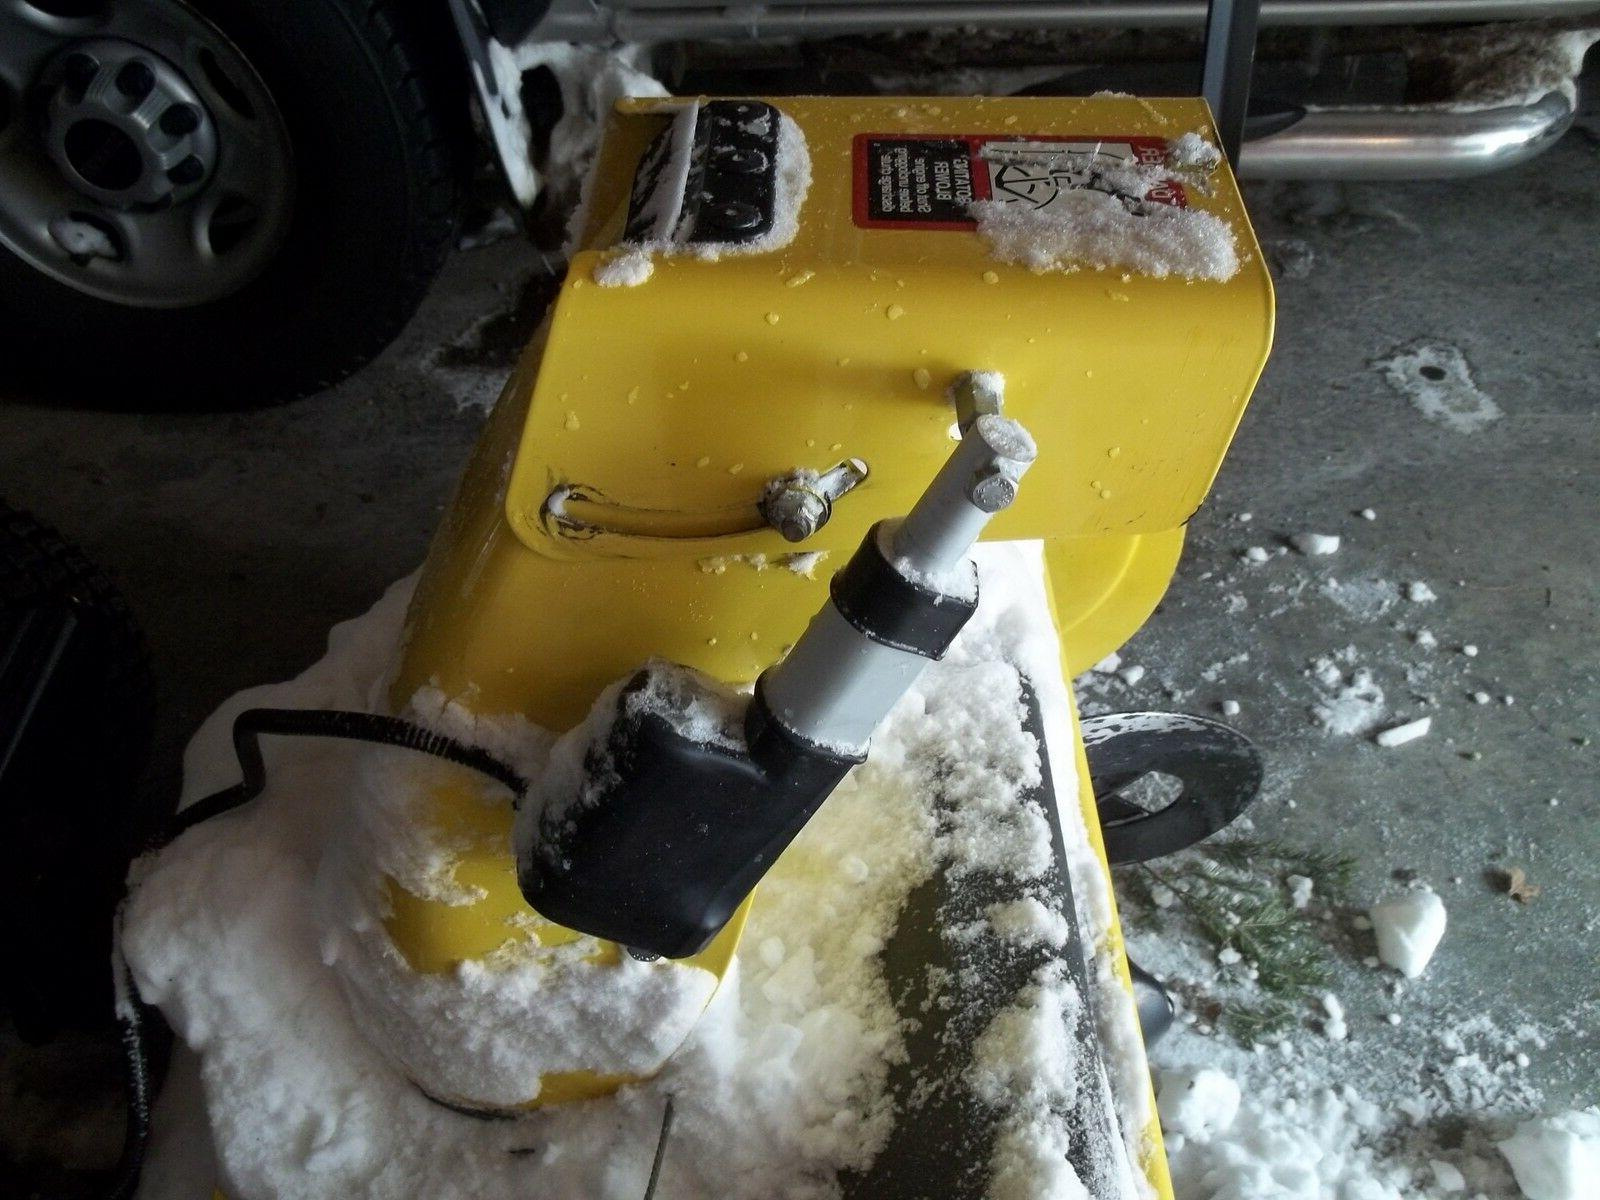 FOR JOHN SNOW BLOWER LINEAR ACTUATOR CHUTE PLANS